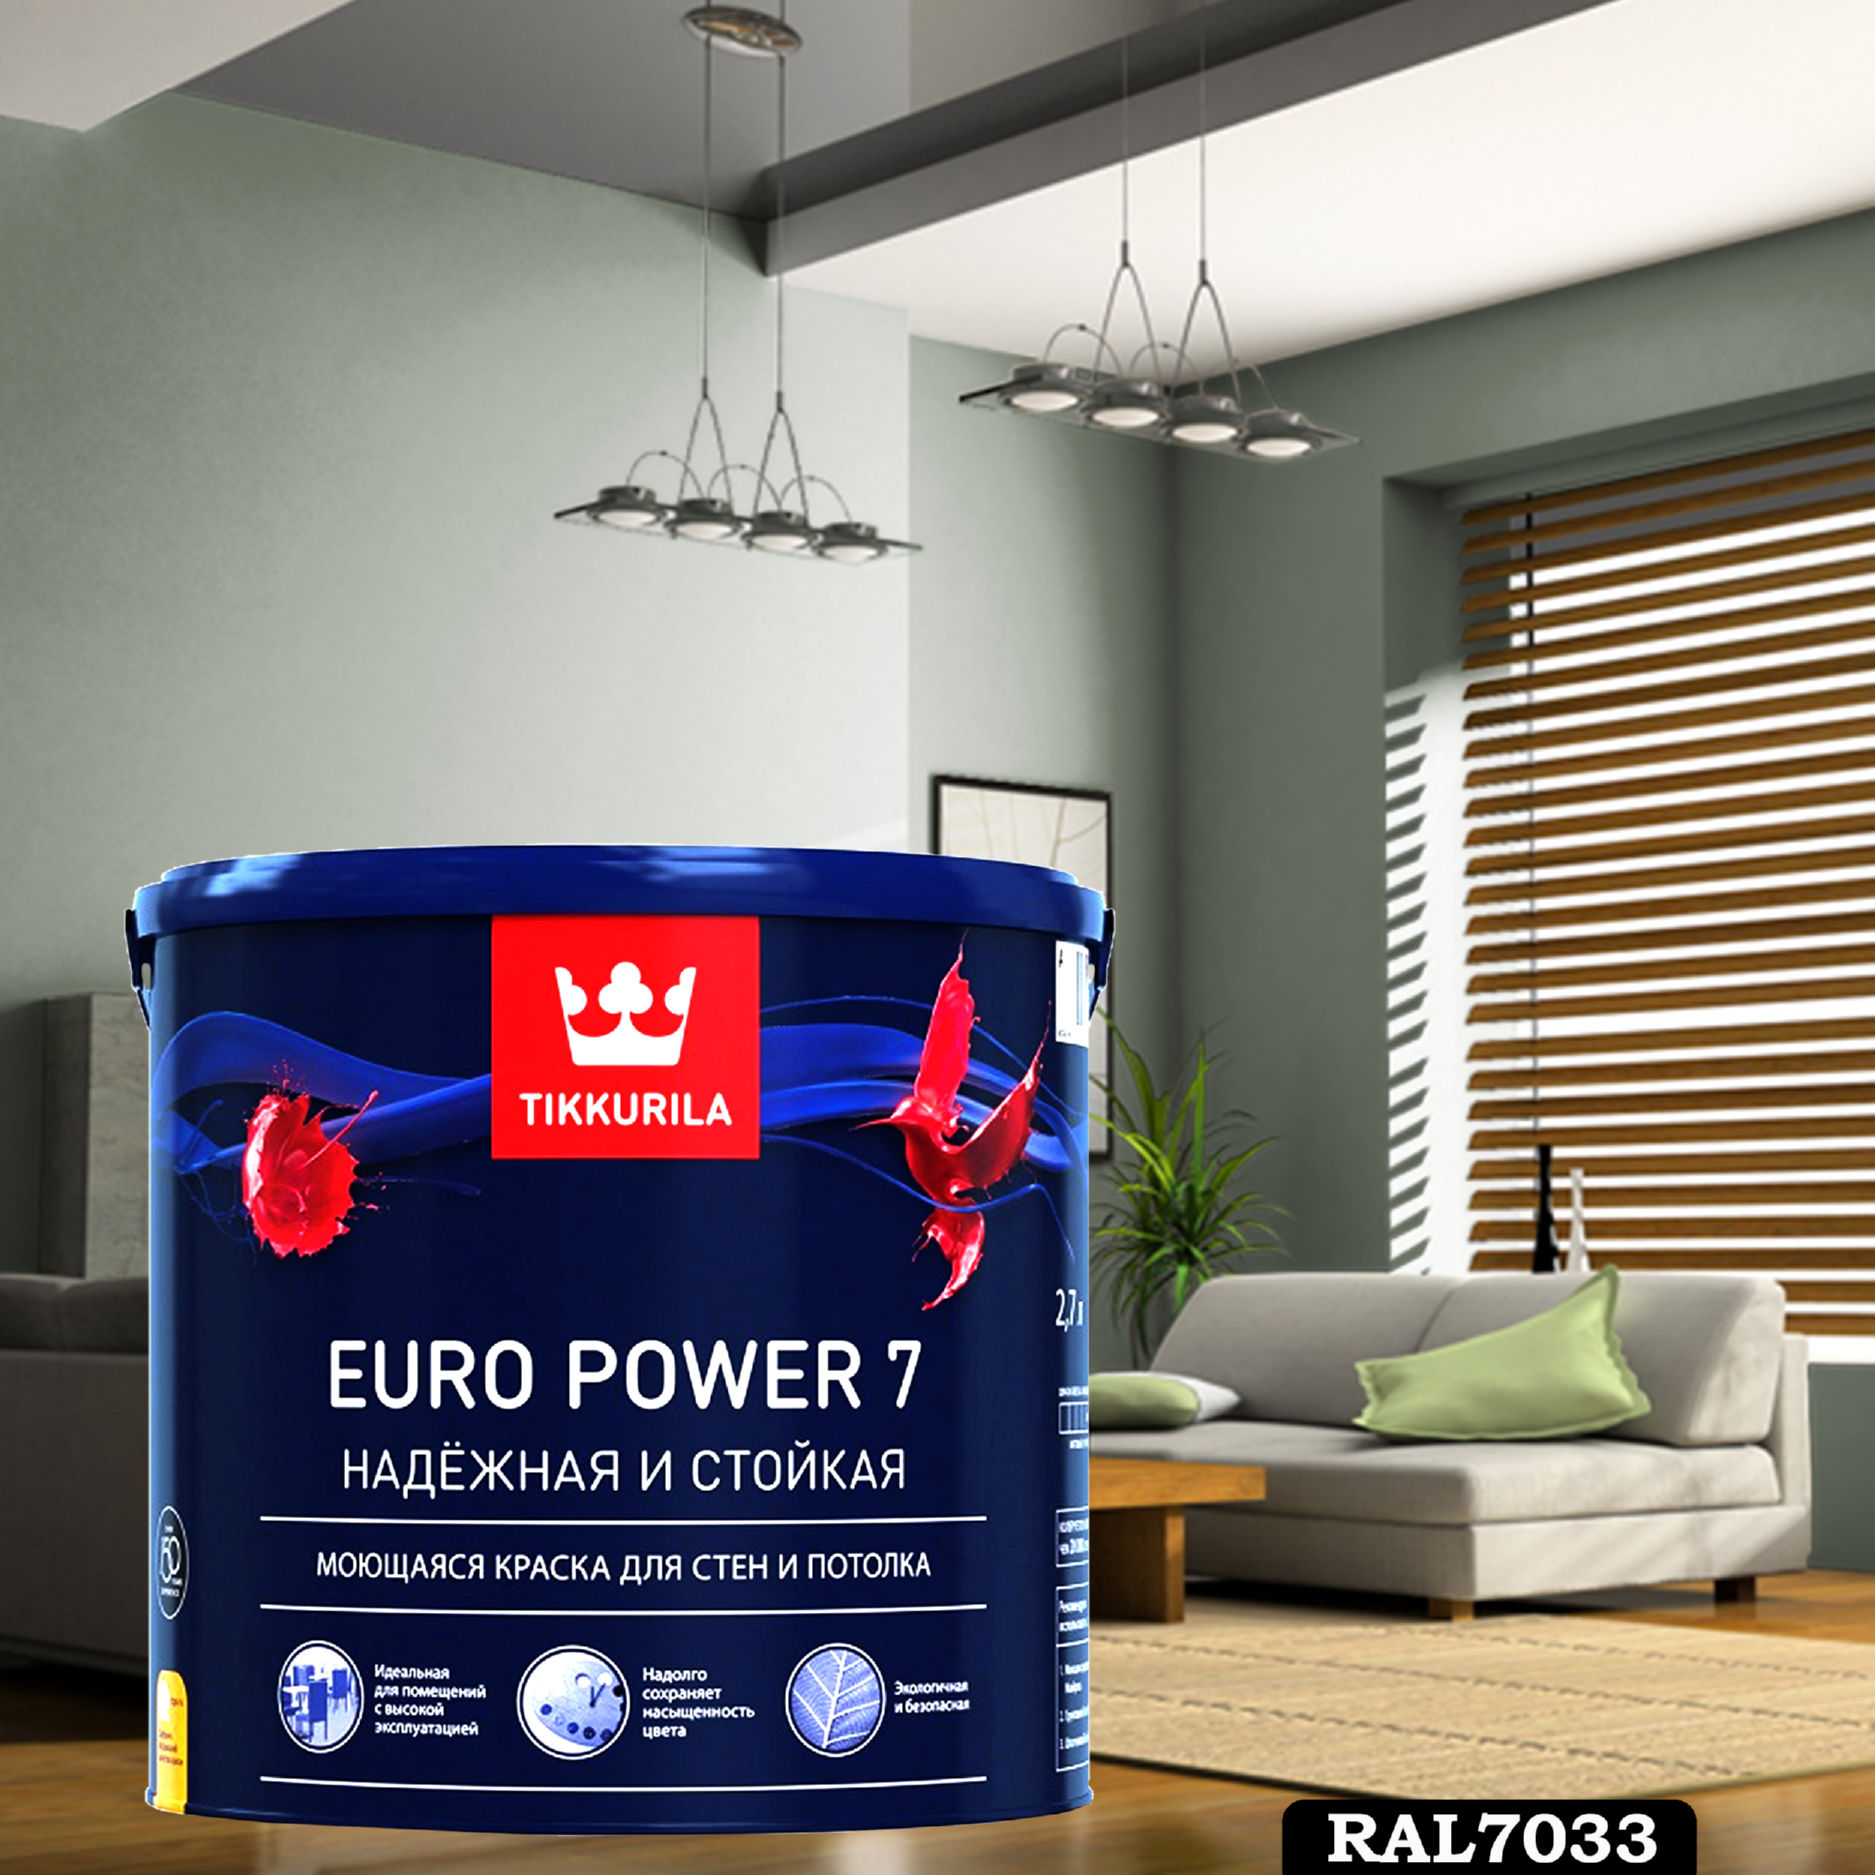 Фото 24 - Краска TIKKURILA Euro Power 7,  RAL 7033 Серый-цемент, латексная моющаяся матовая интерьерная, 9 л.